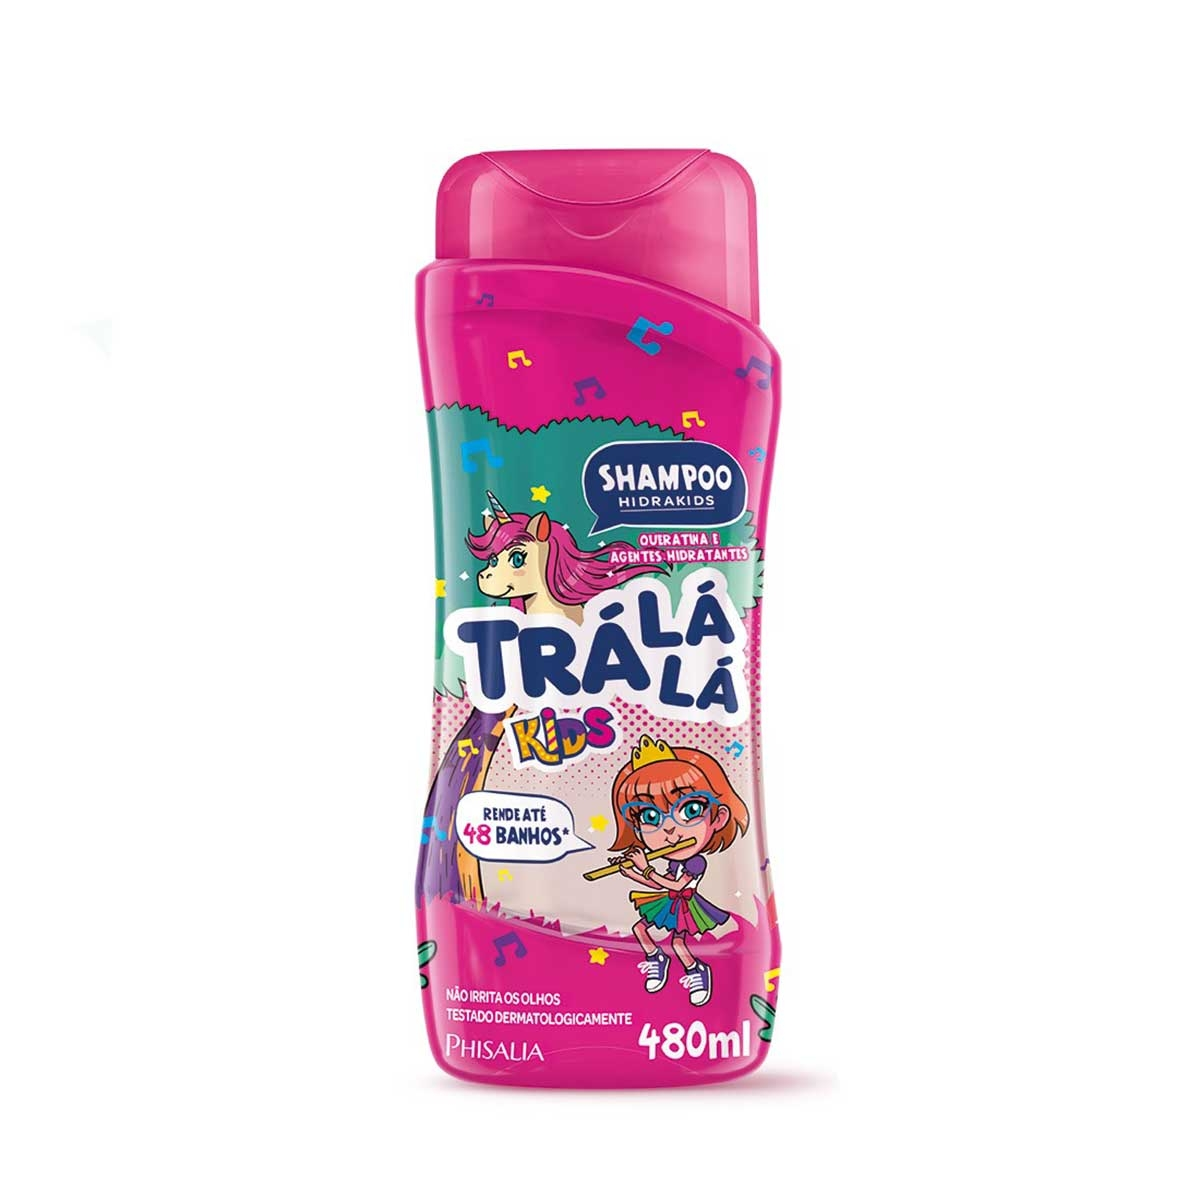 Shampoo Trá Lá Lá Hidrakids com 480ml 480ml